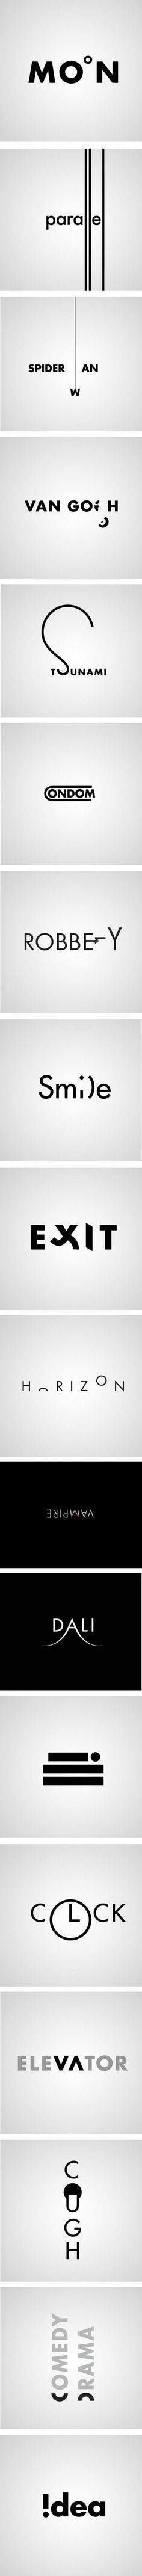 Visual words.